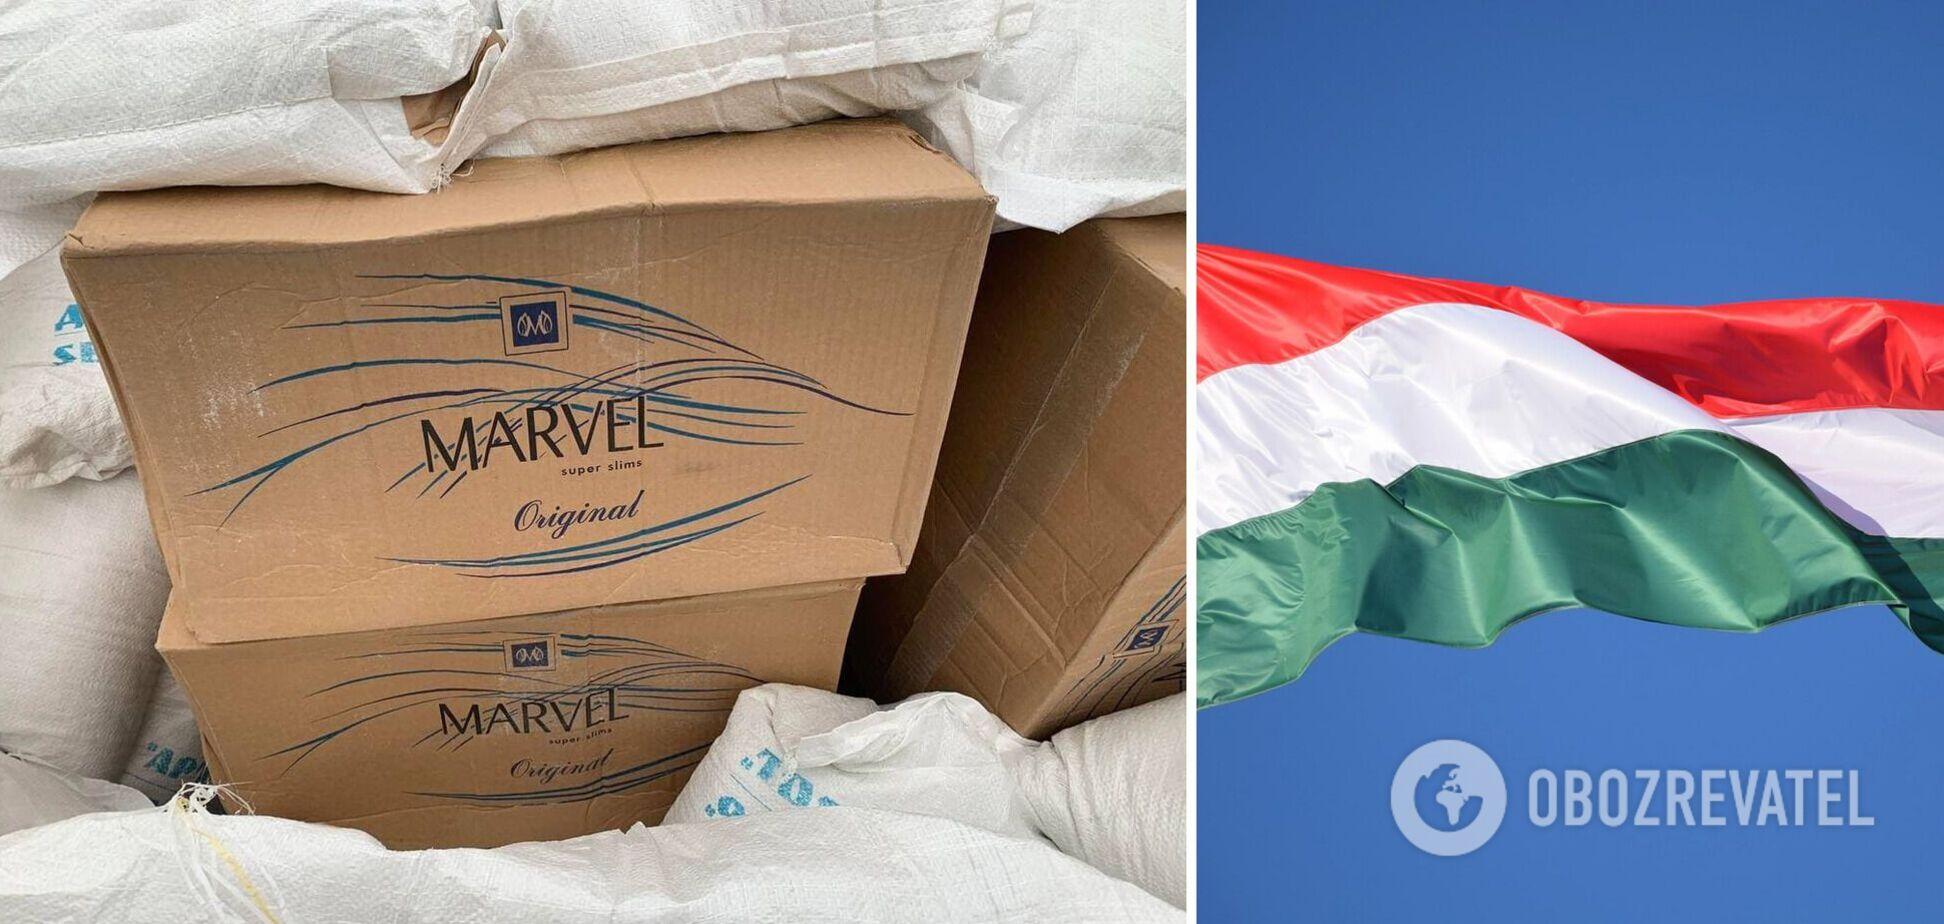 З України в Угорщину постачали контрабандні сигарети